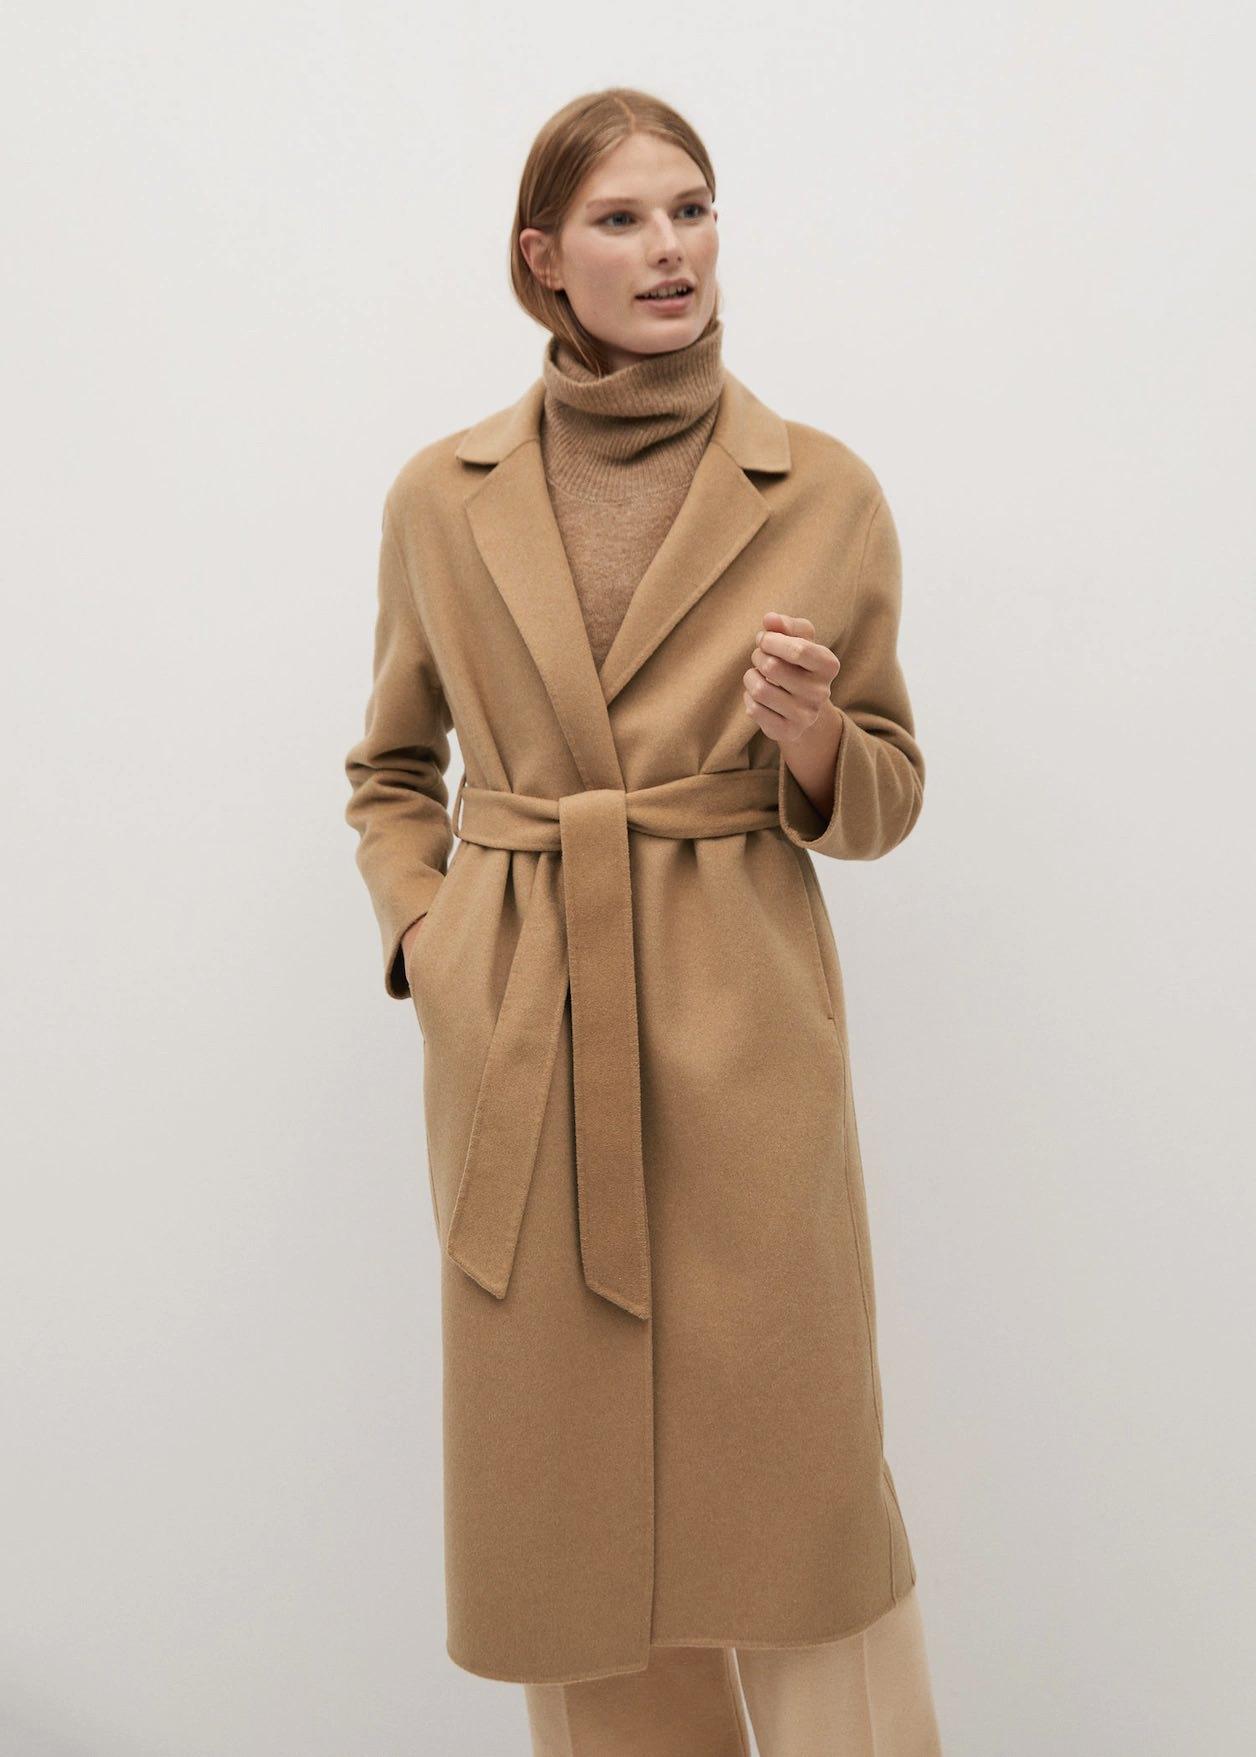 Handmade wool coat